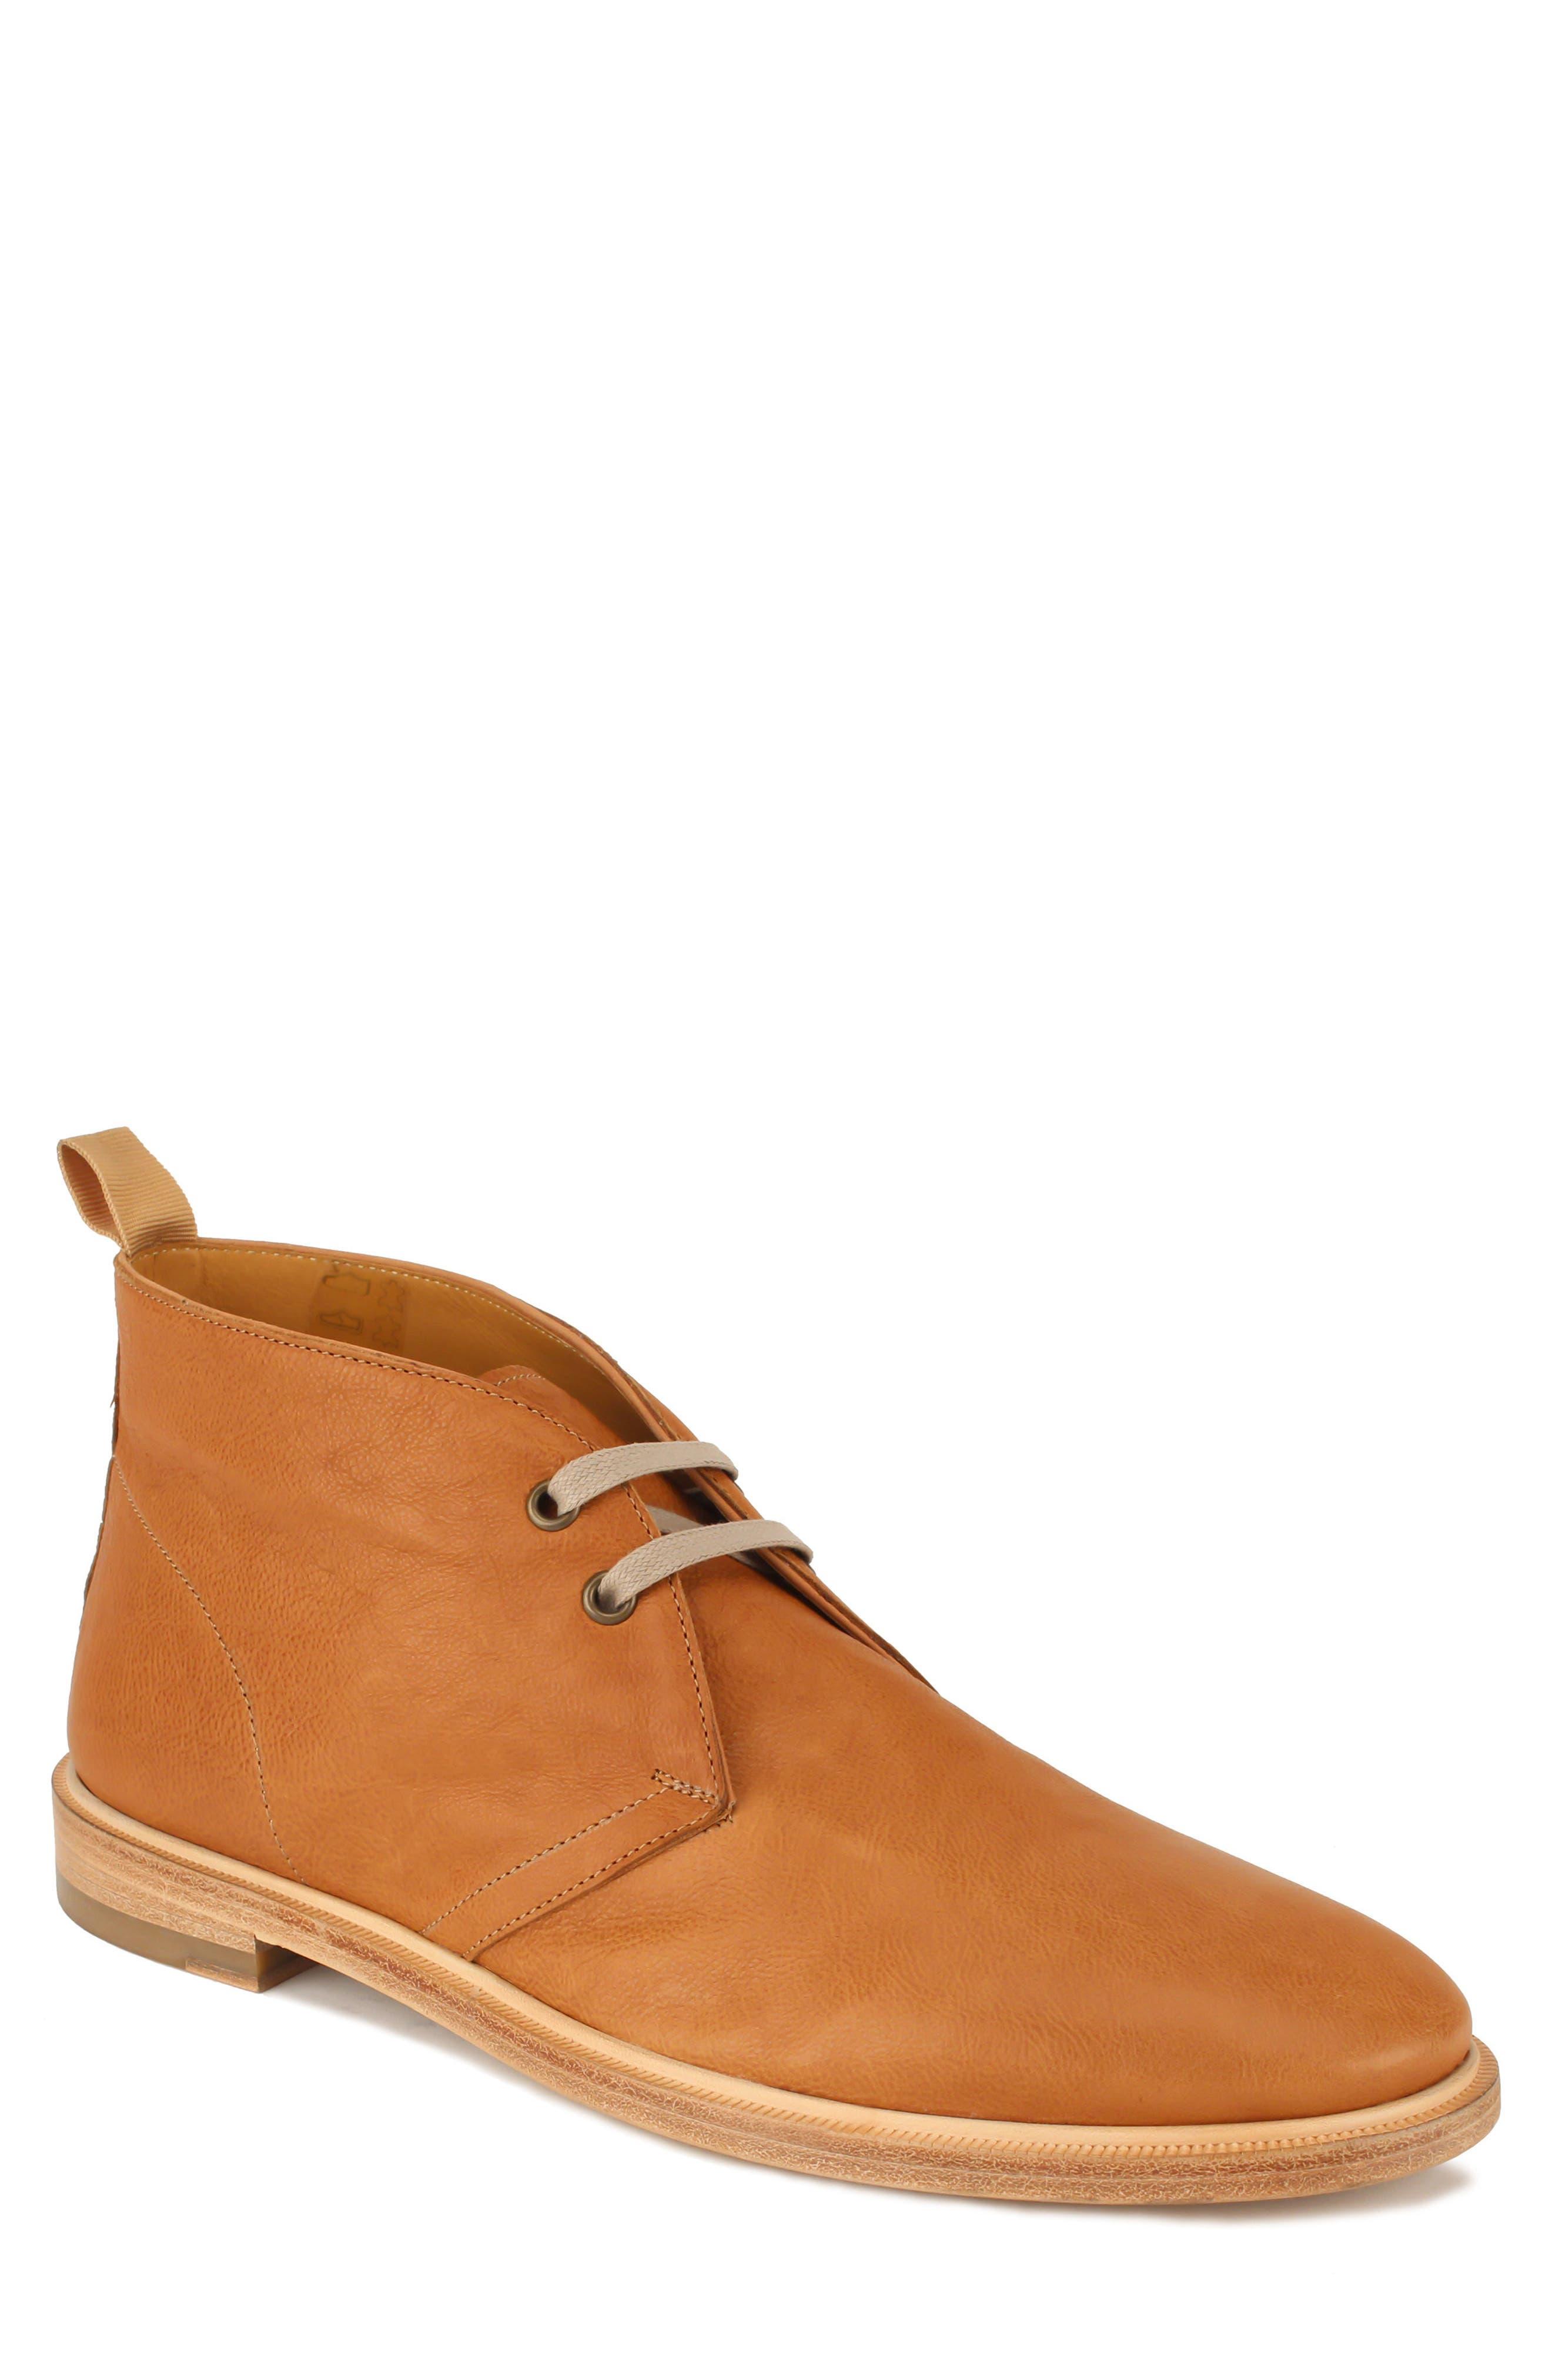 Luke Chukka Boot,                             Main thumbnail 1, color,                             Sahara Leather